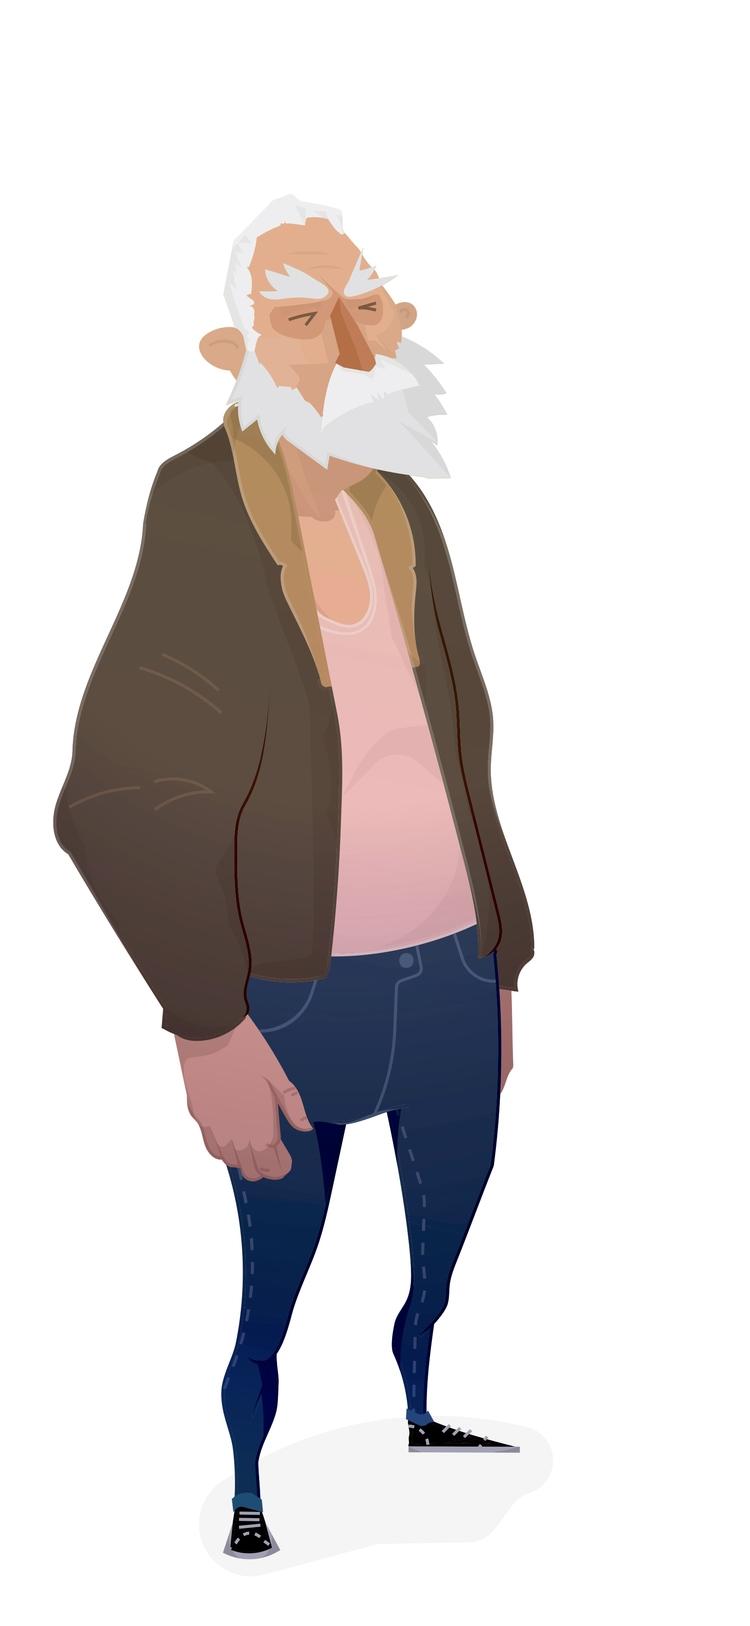 ENJOY - quick, character, sketch, - krankcrabs | ello